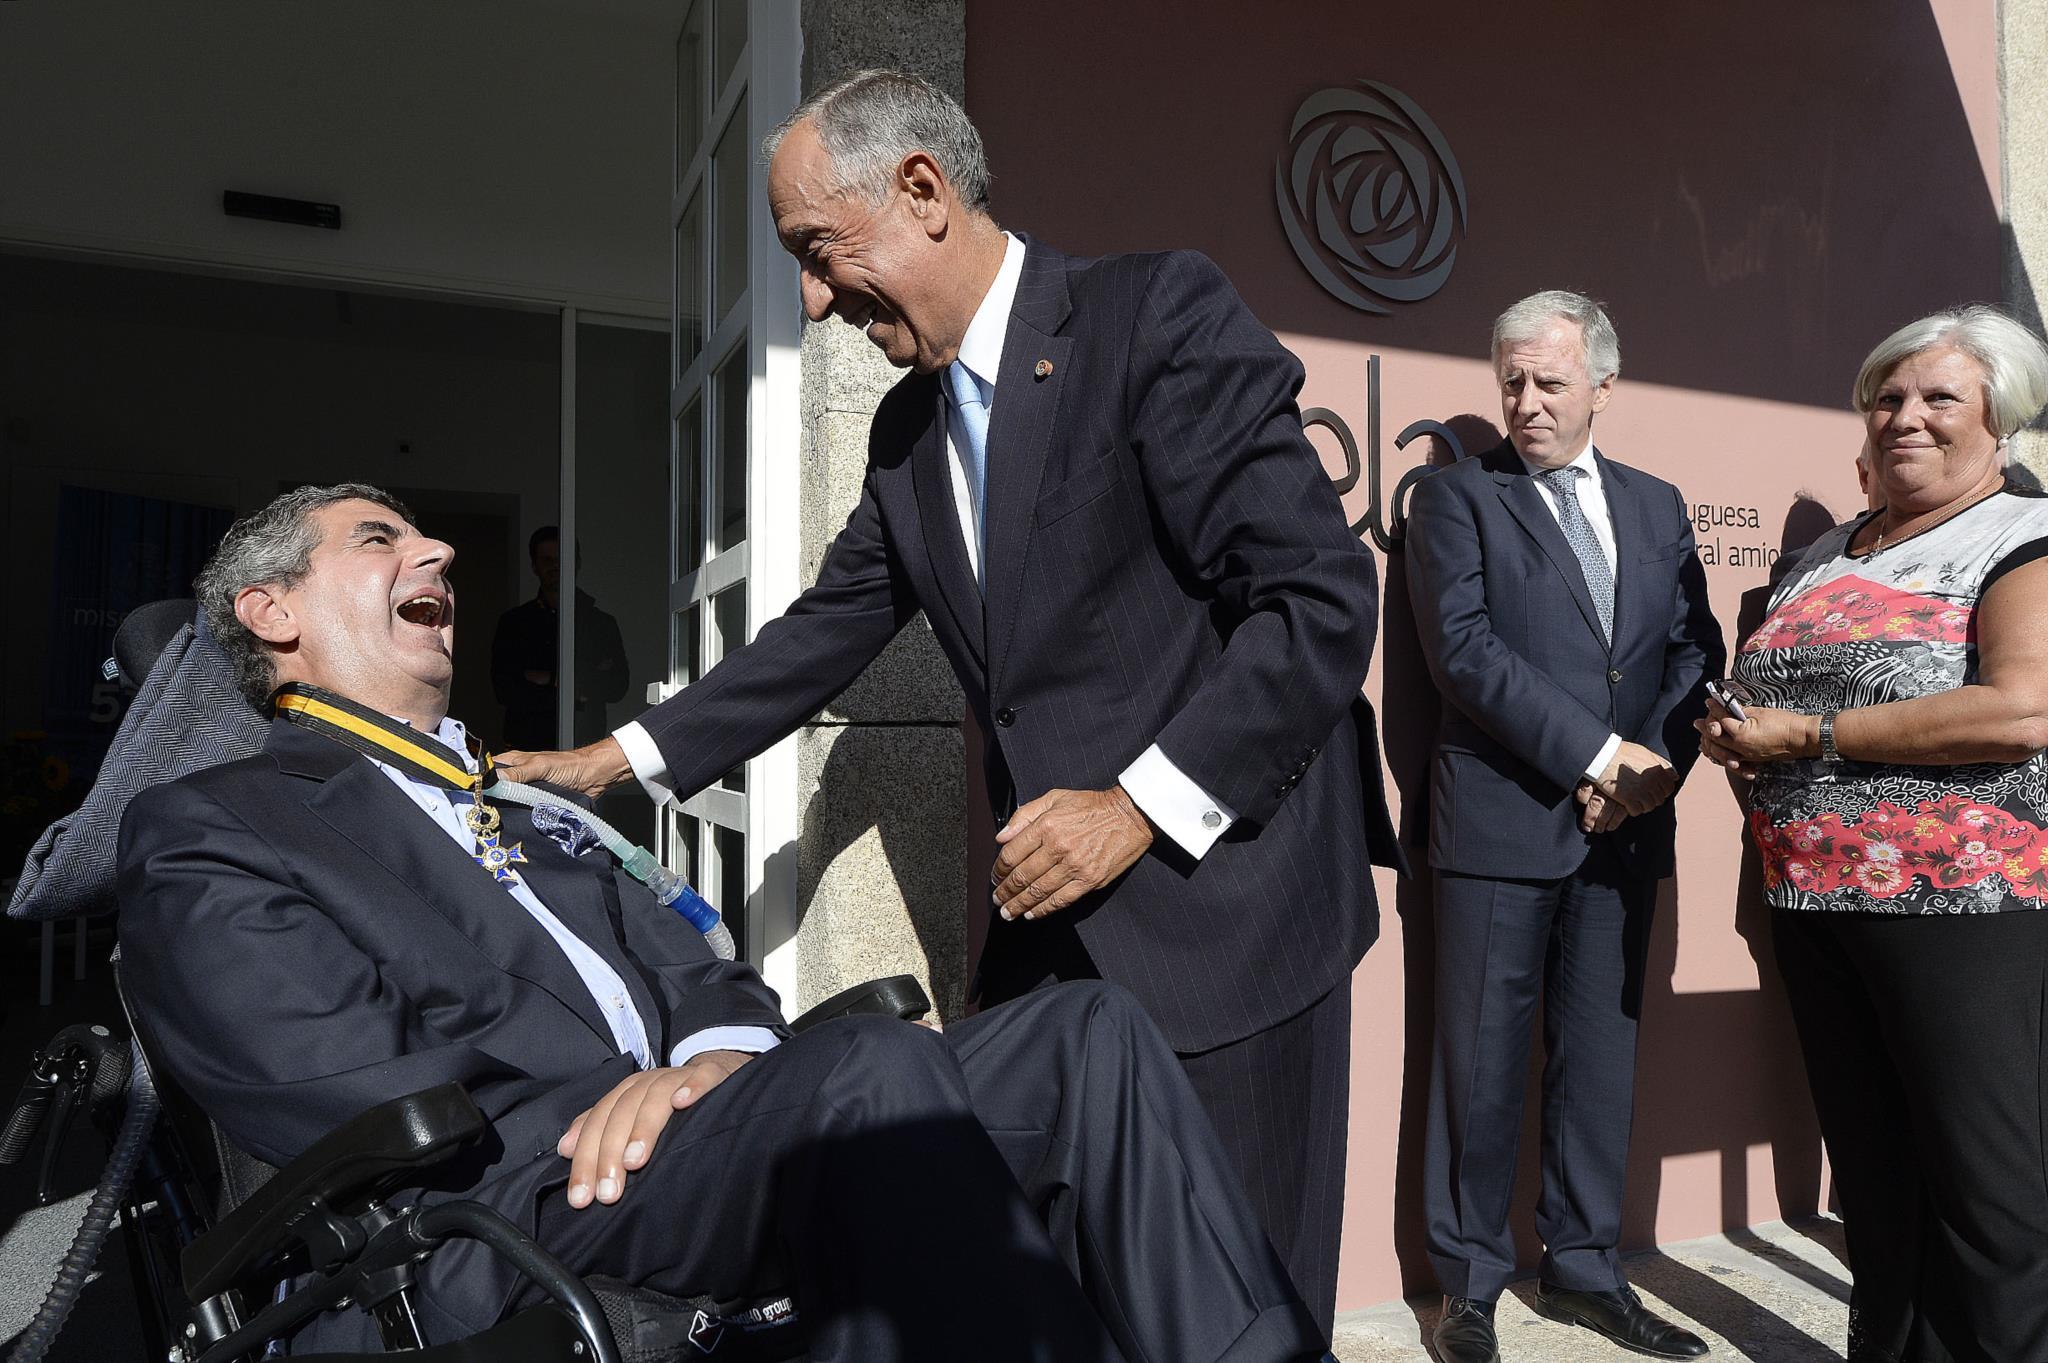 Salvador Guedes foi condecorado por Marcelo Rebelo de Sousa com a Ordem de Mérito